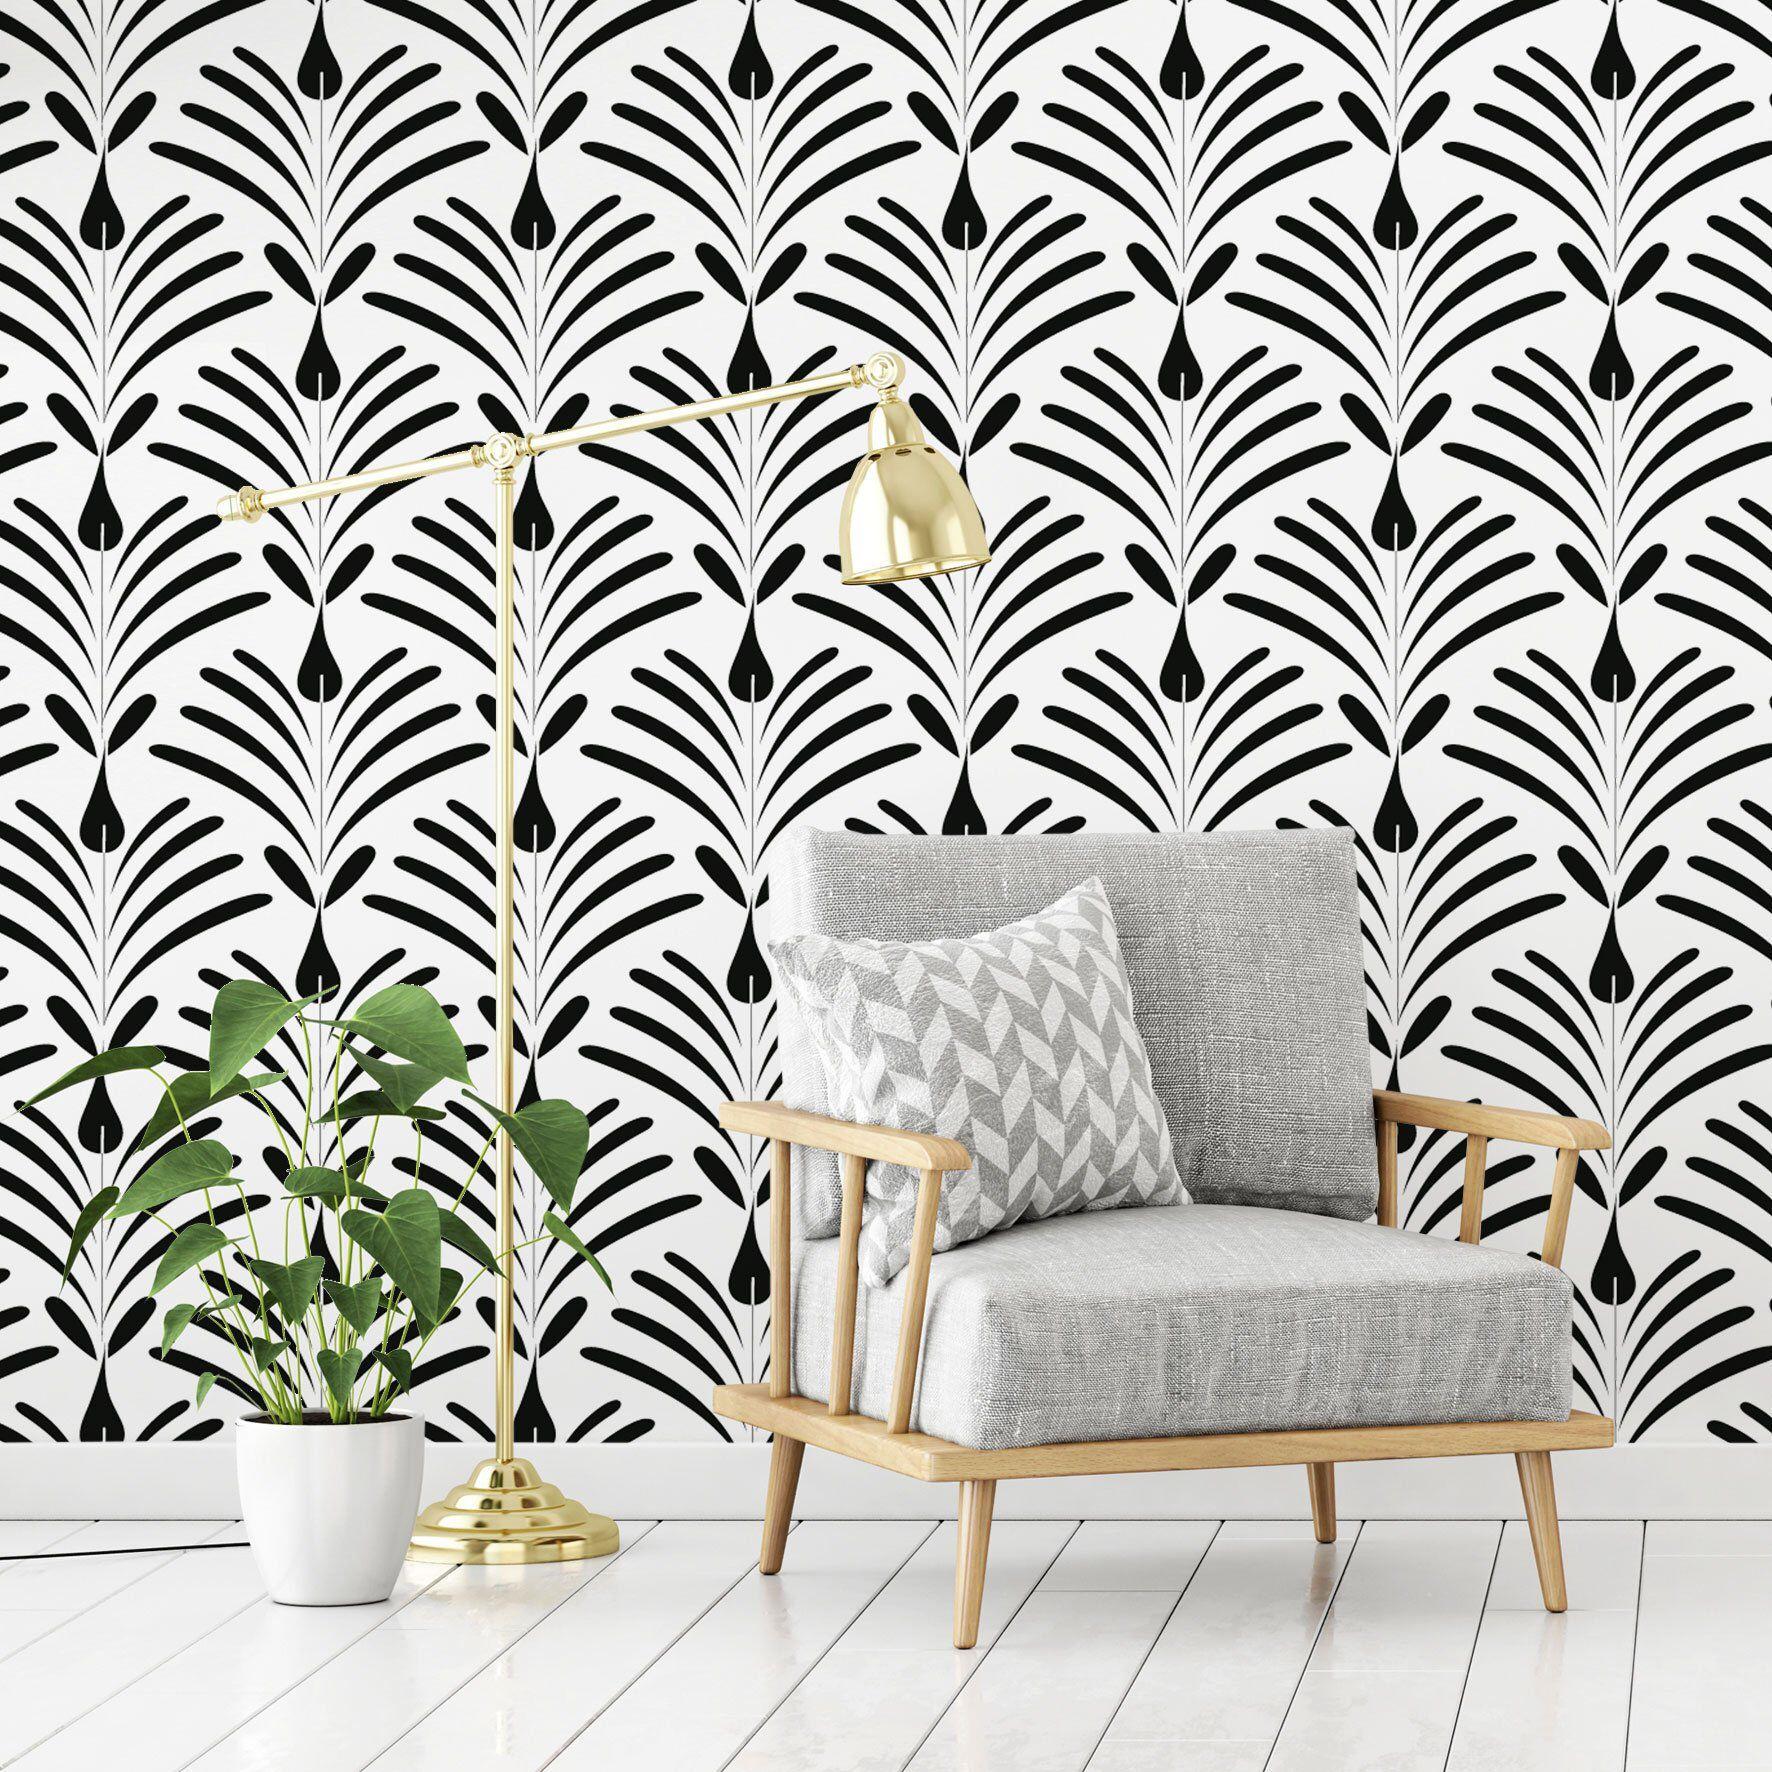 Black and White Geometric Wallpaper, Self Adhesive